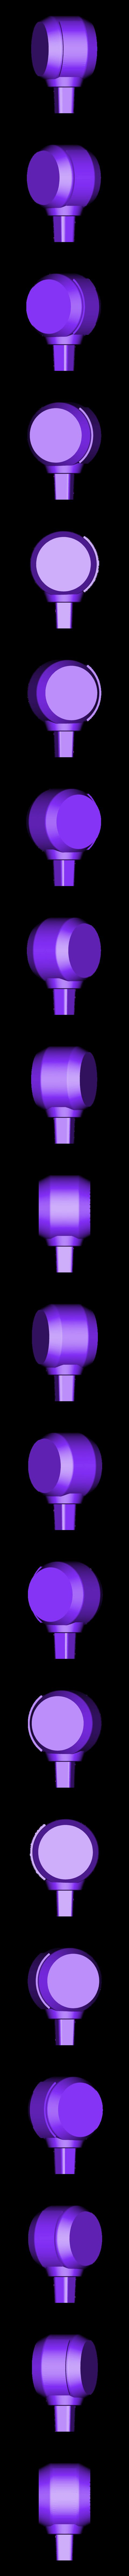 Elbow-Left.stl Download STL file Hammond's Wrecking Ball Mech from Overwatch • 3D printer template, FunbieStudios